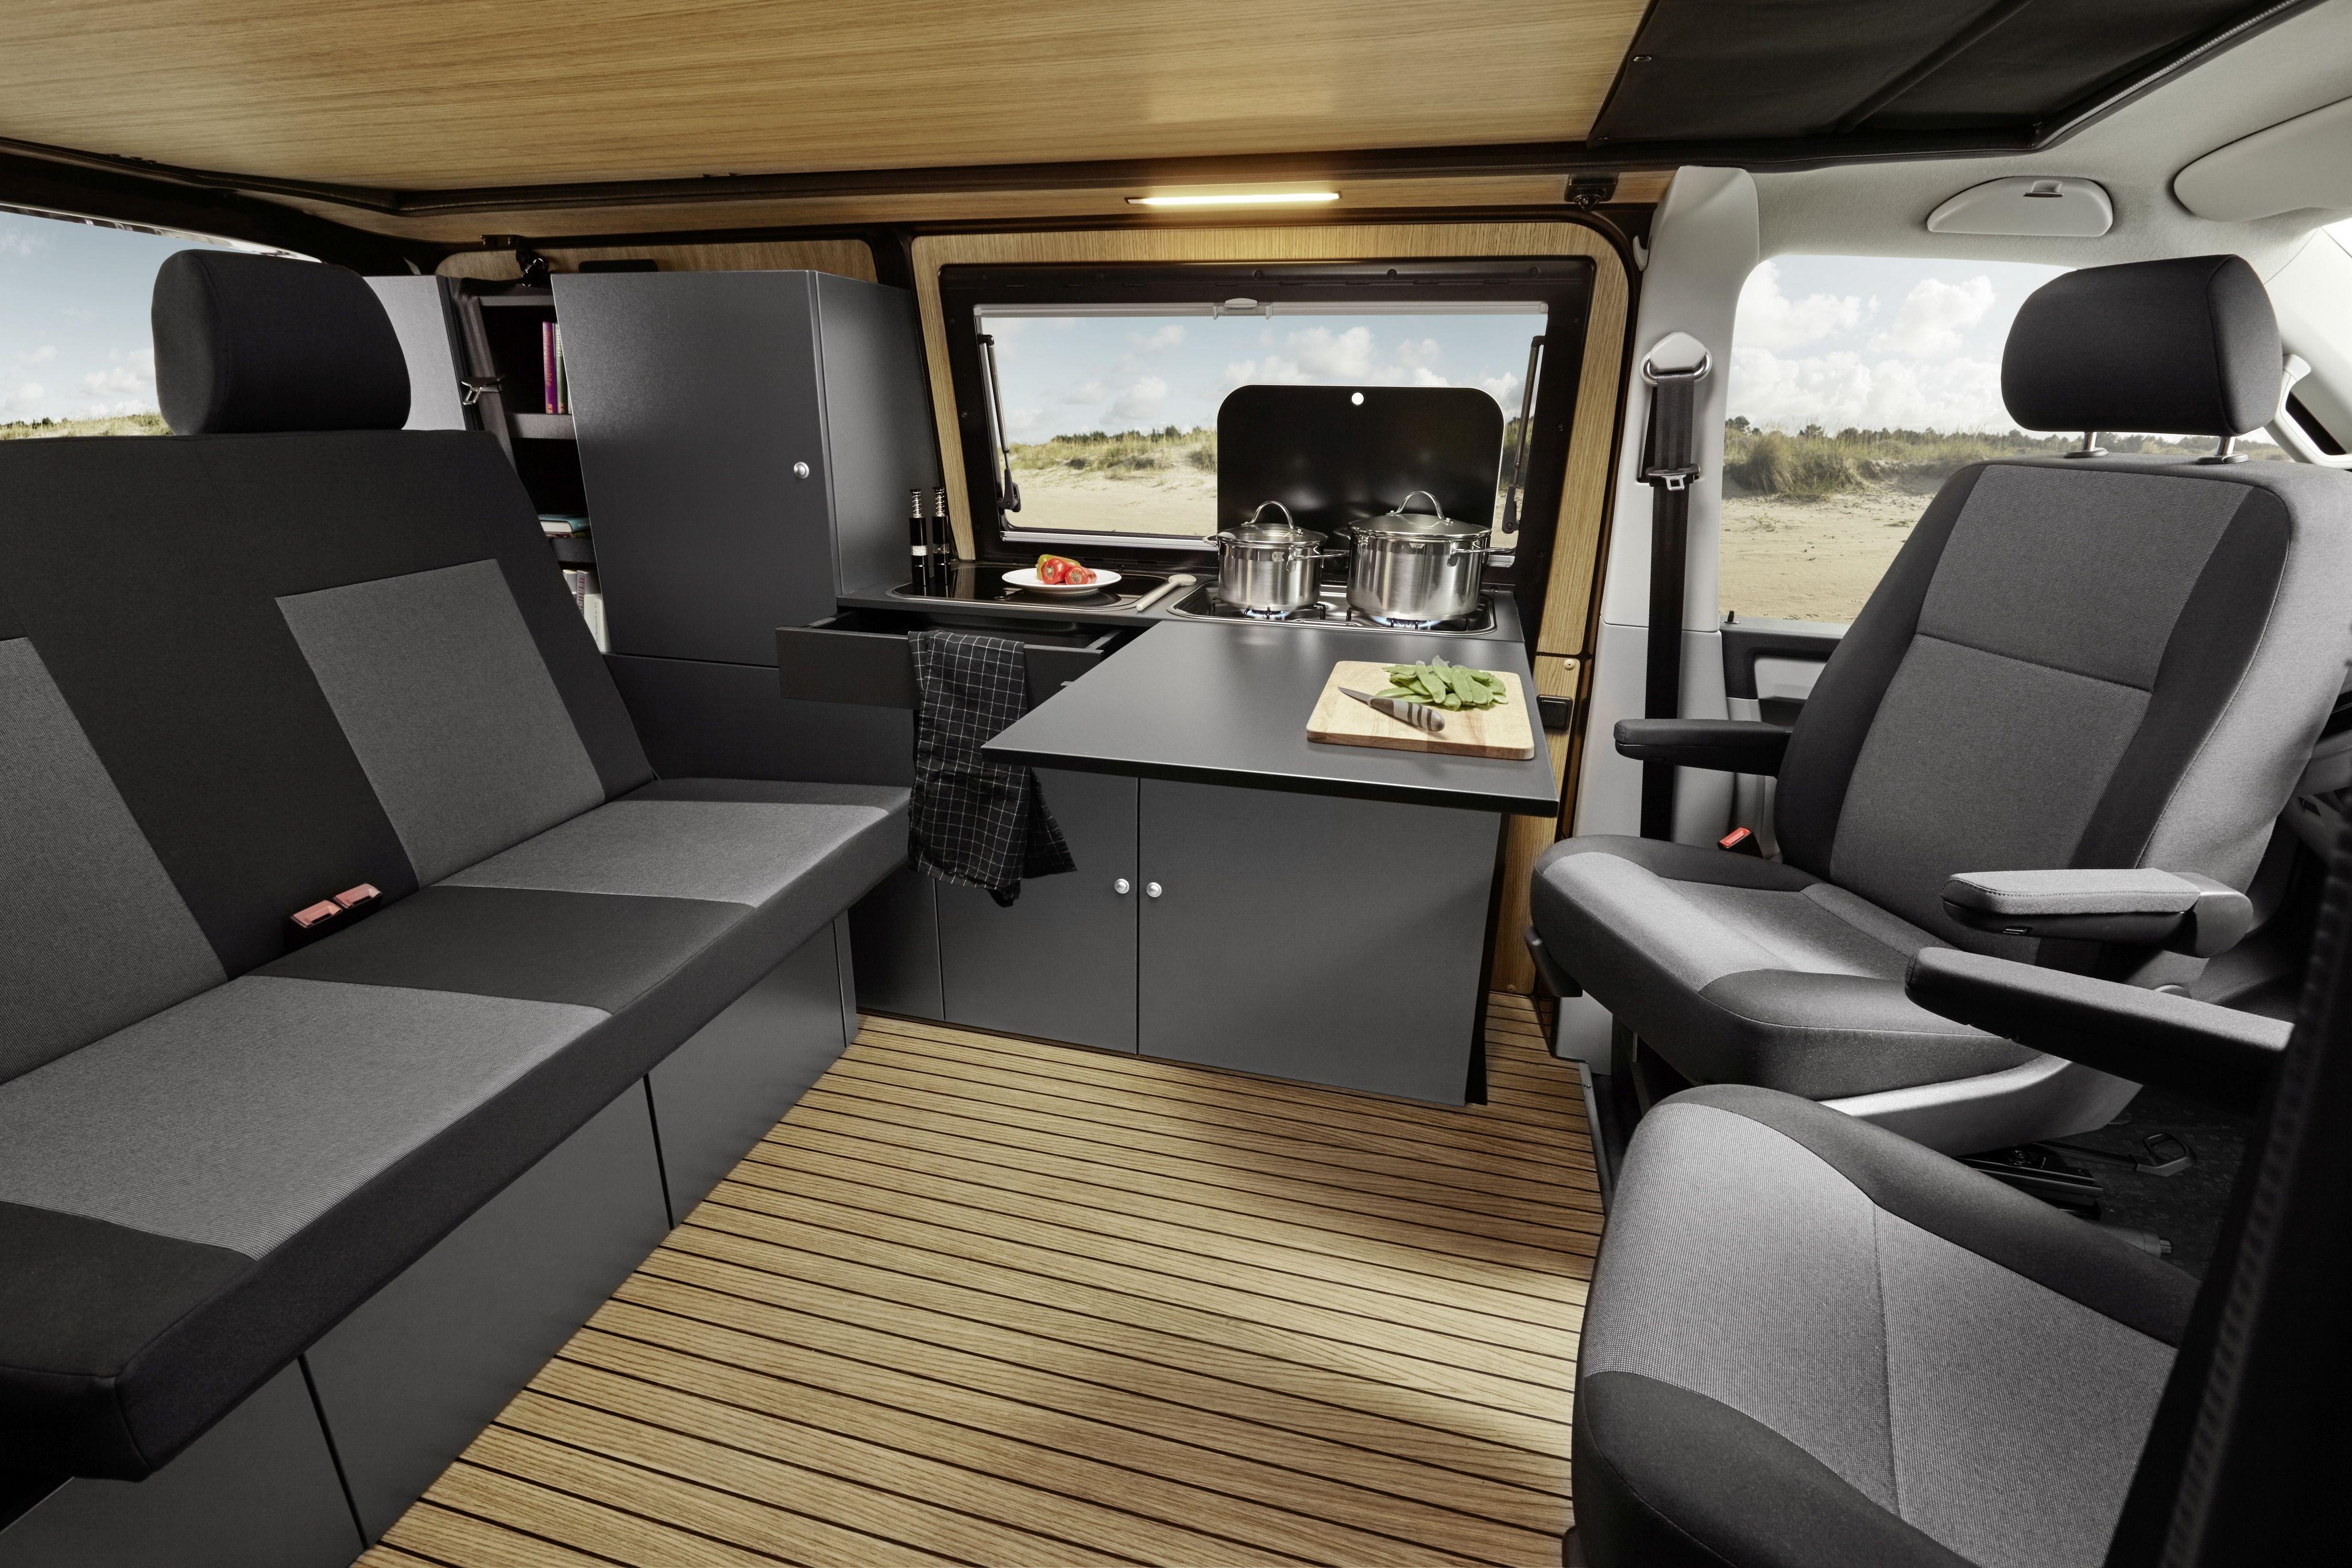 30 Inspiration Photo Of Volkswagen Camper Interior Camper And Travel Penitifashion Camper Interior Volkswagen Interior Volkswagen Bus Interior